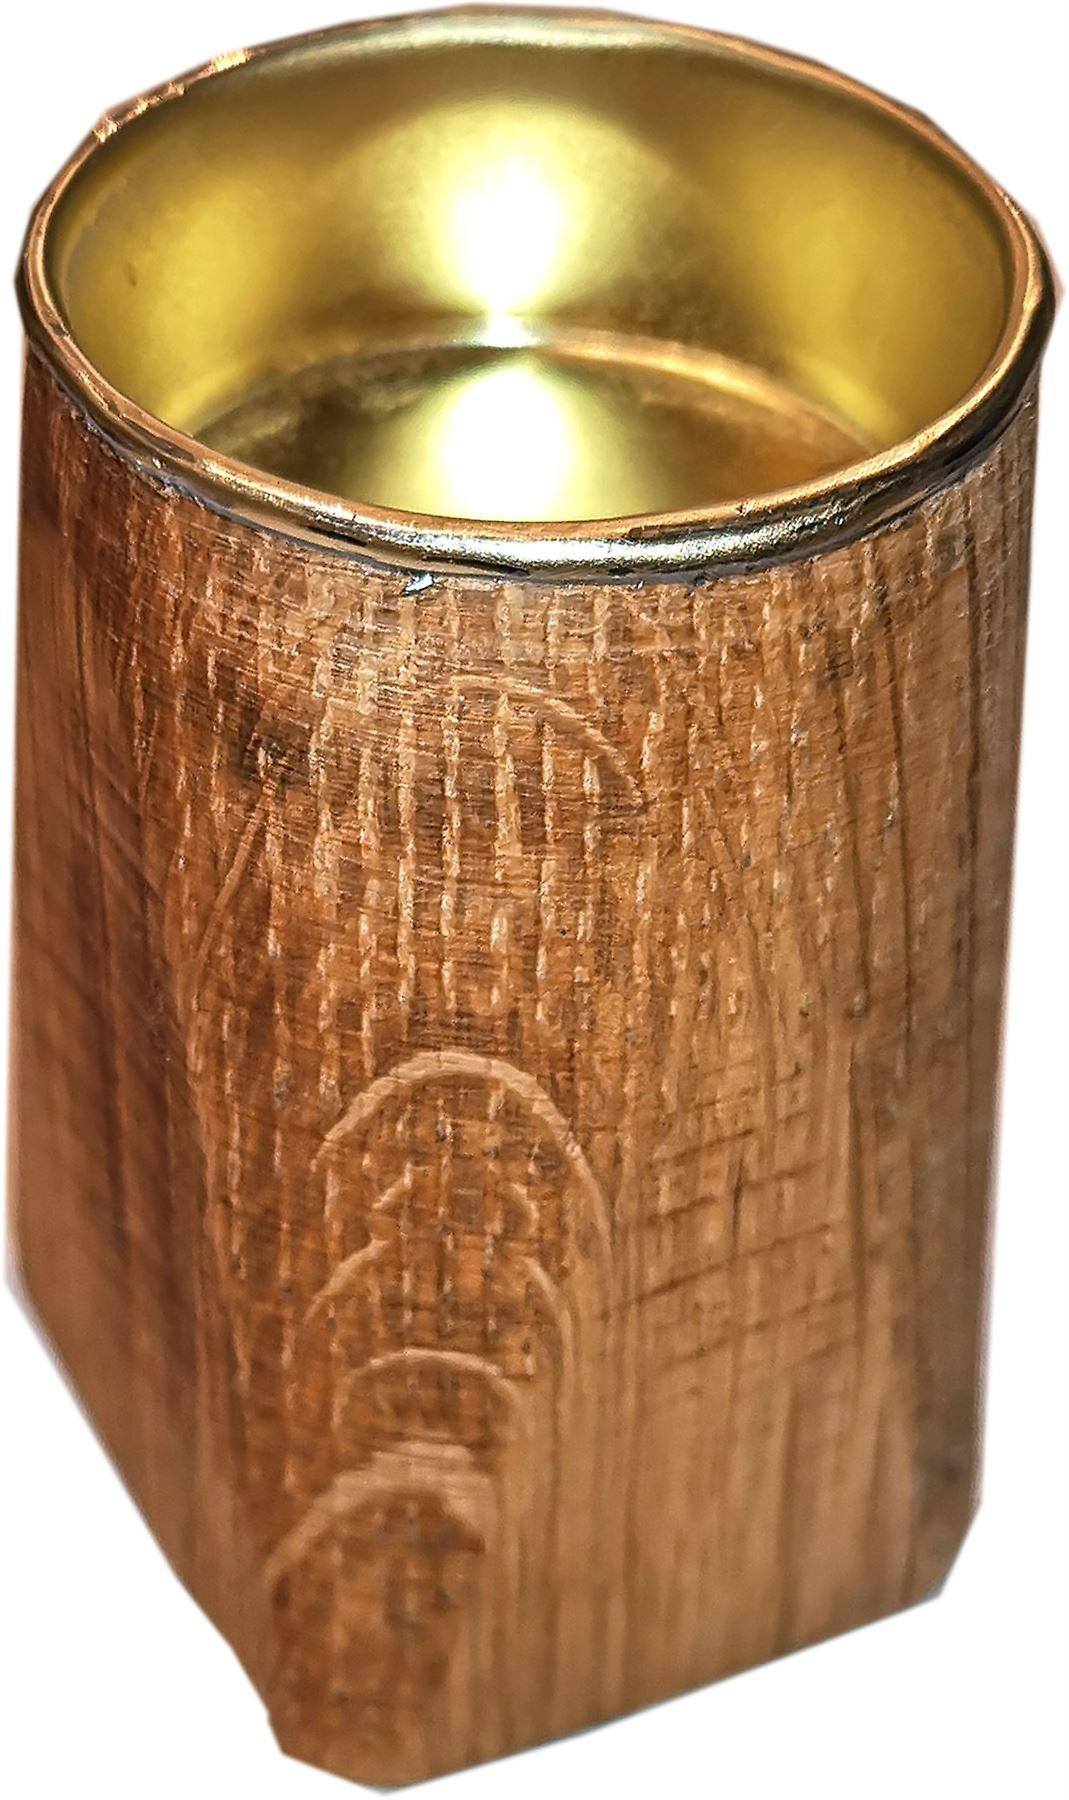 Grieves Wood Turning - Turned Oak Tealight Holder